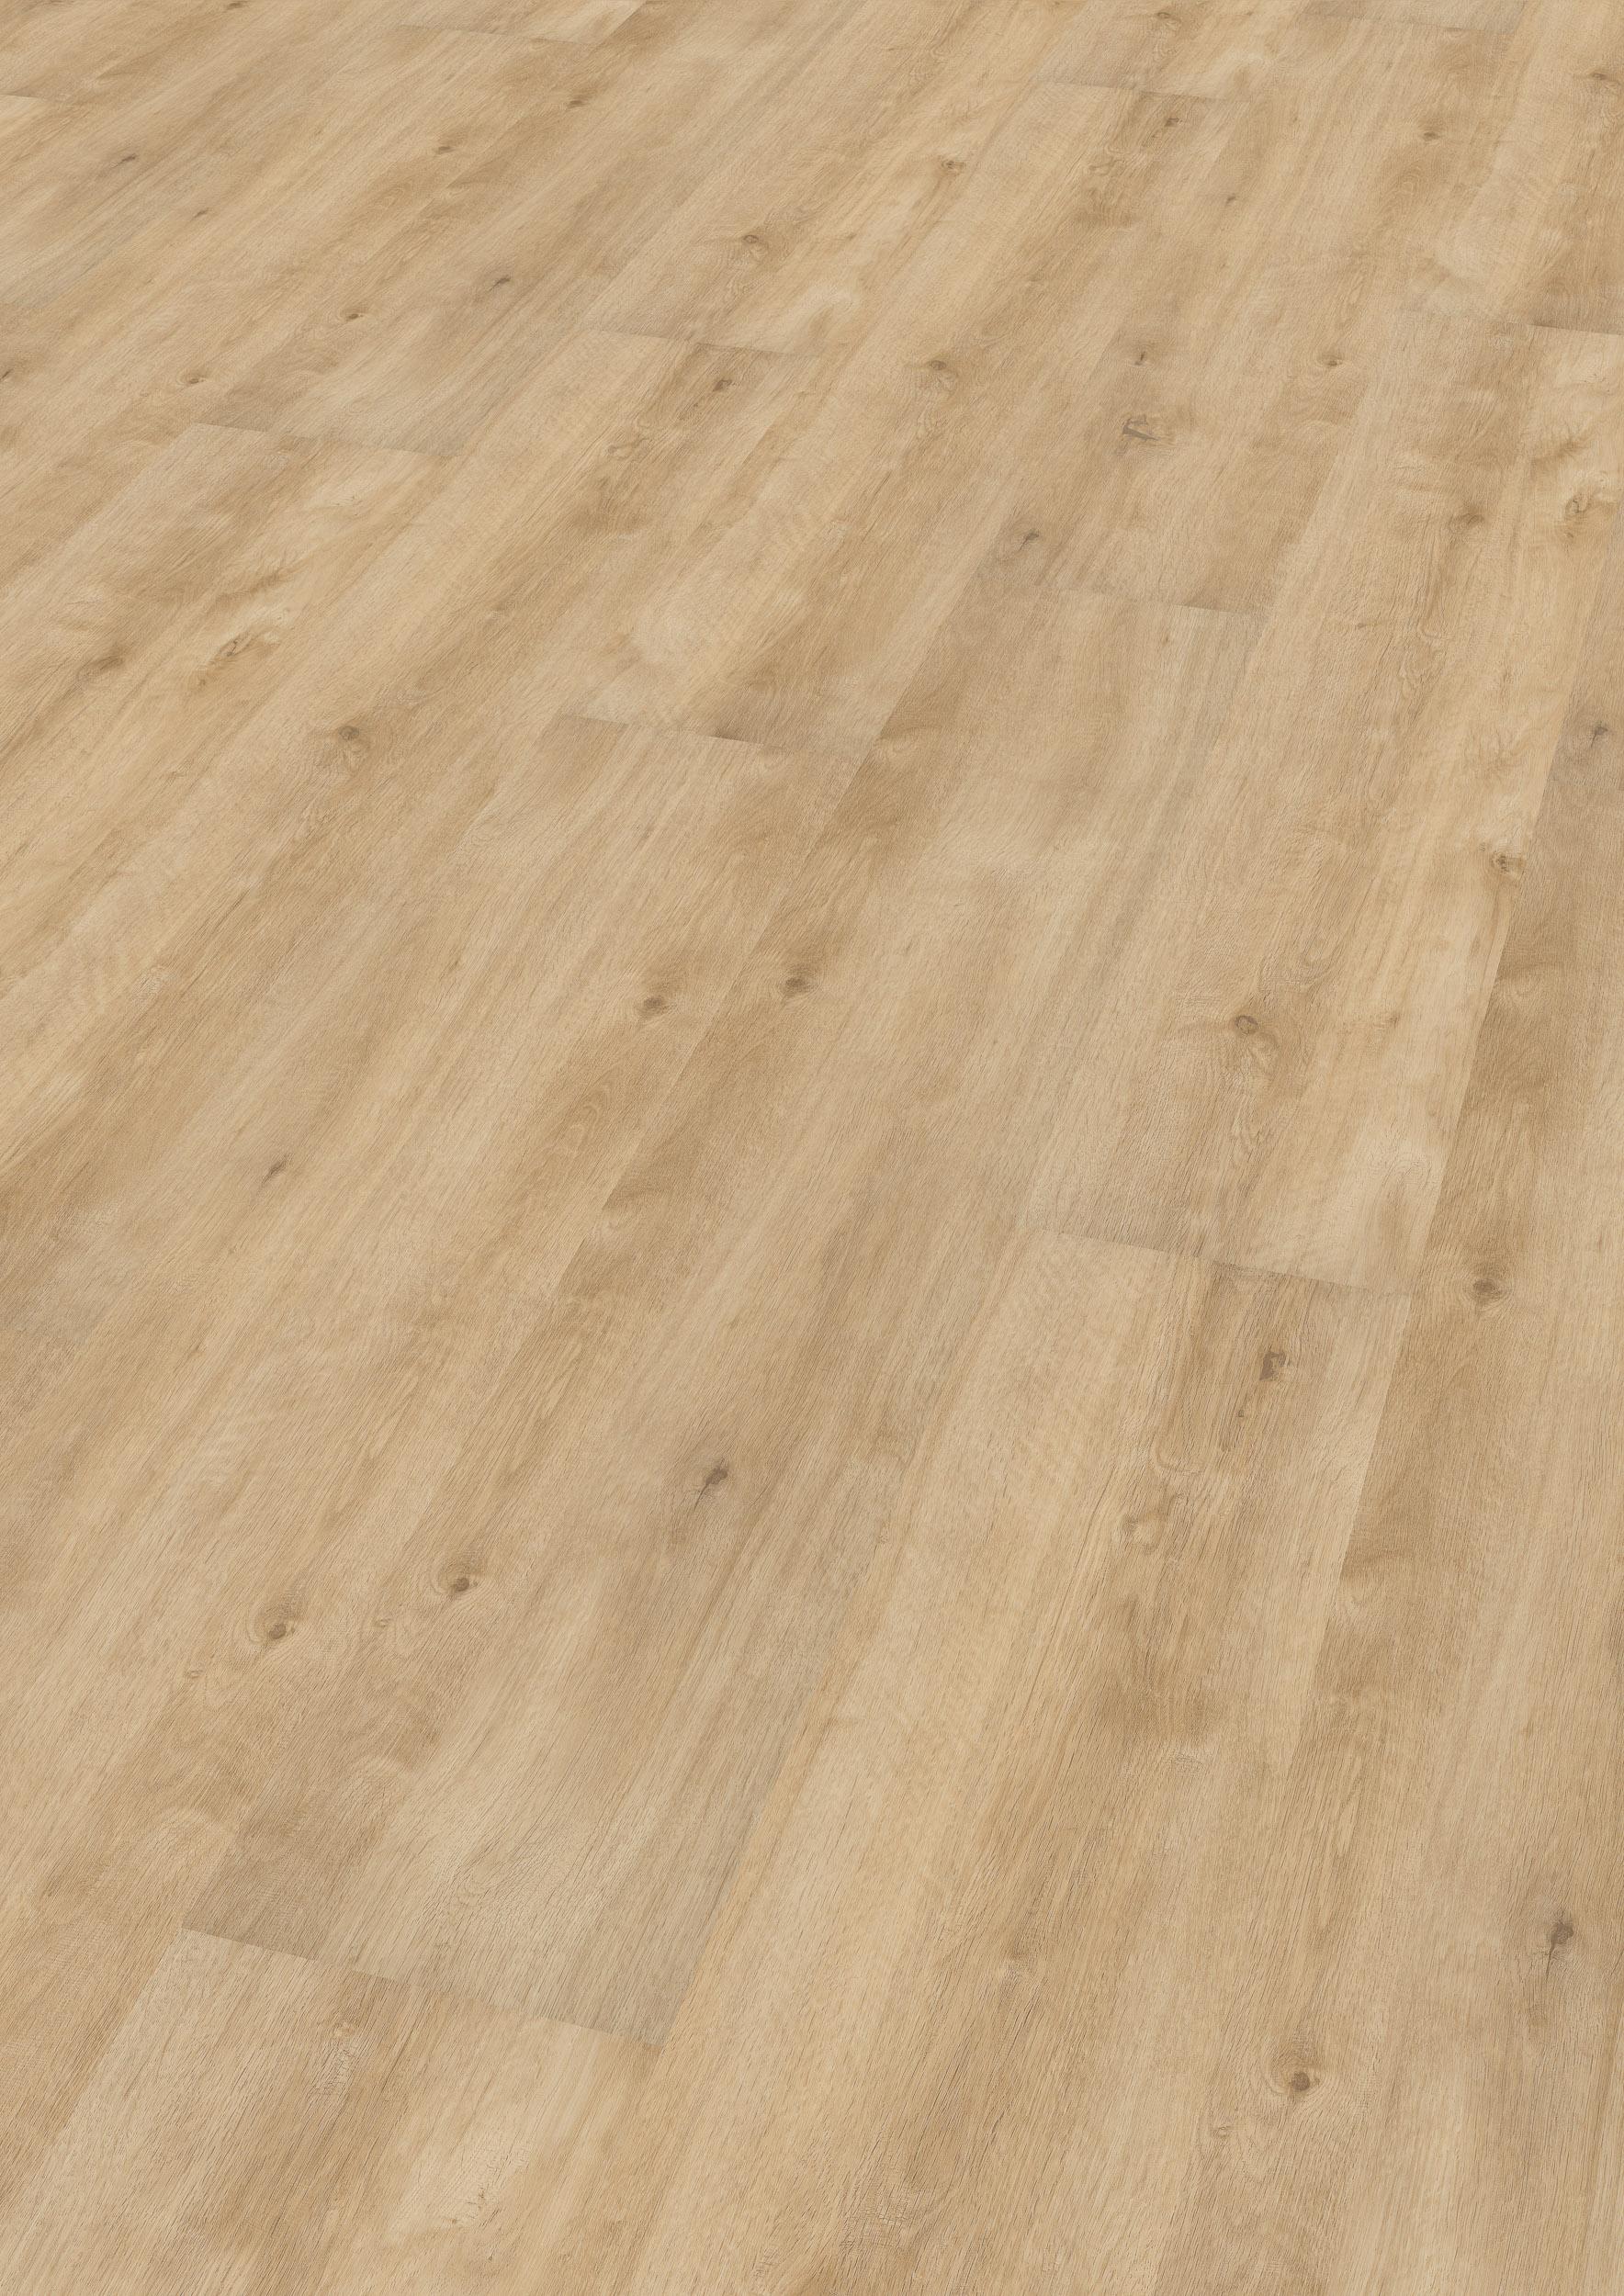 wineo vinyl 2 mm zum kleben woodstock cream wineo 600 wood xl. Black Bedroom Furniture Sets. Home Design Ideas